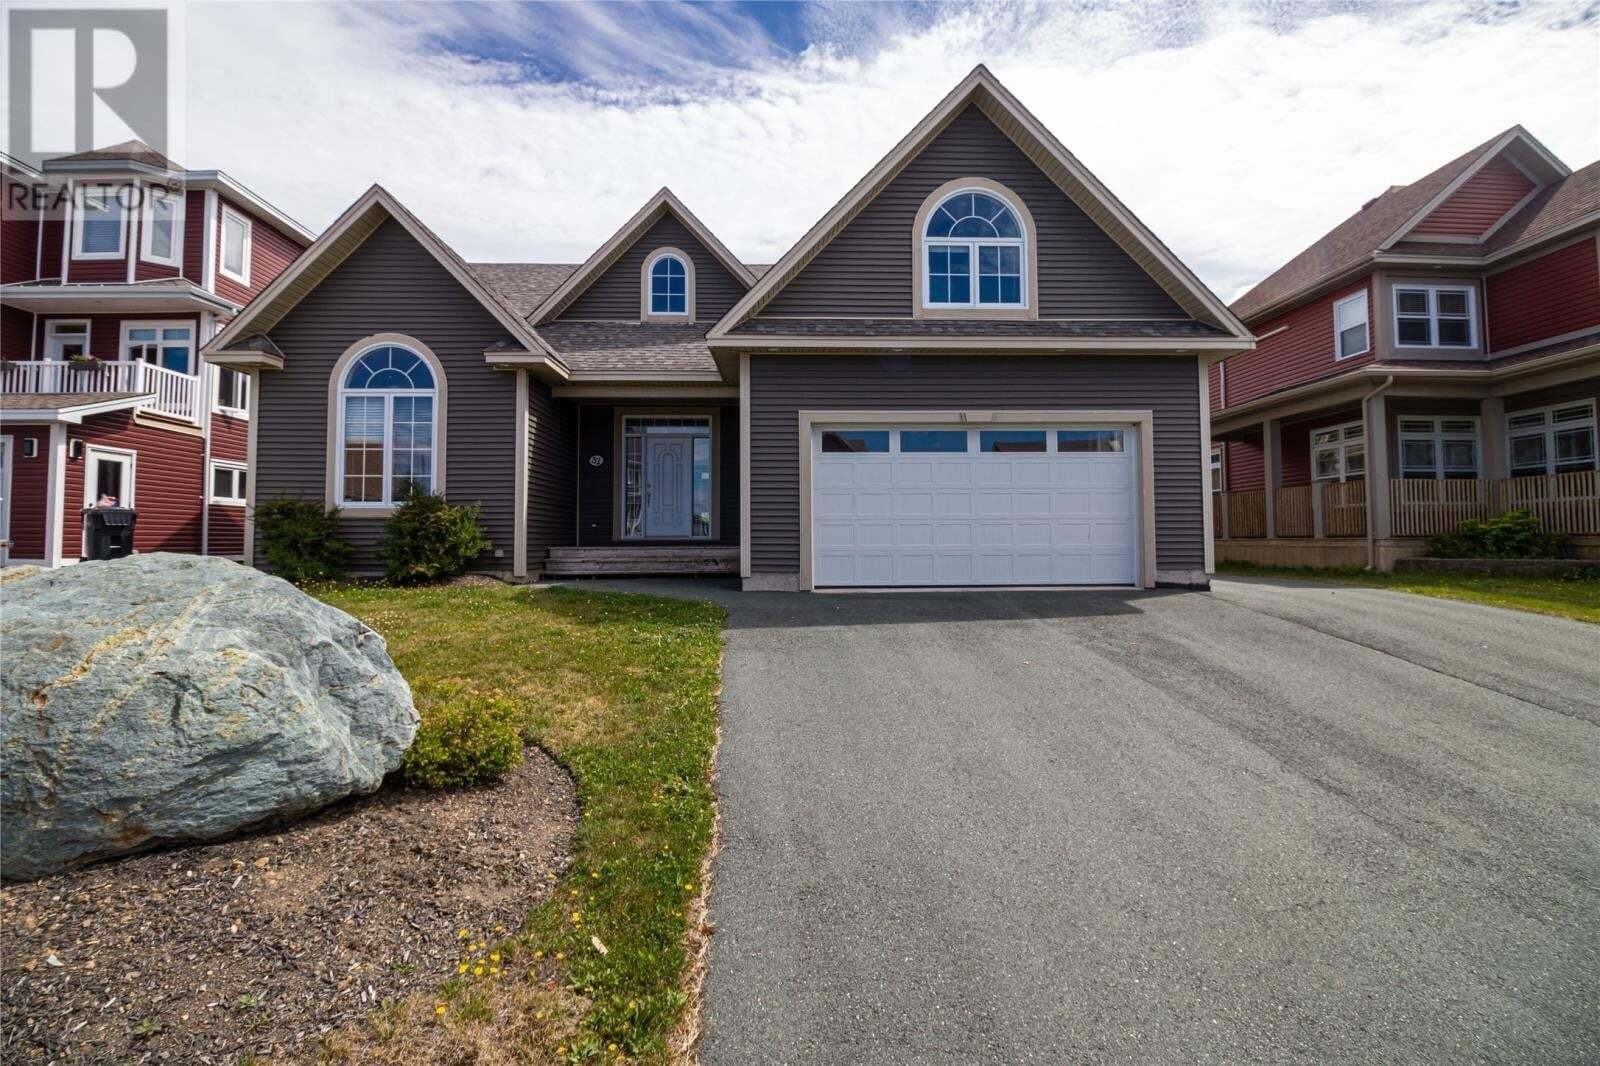 House for sale at 32 Atlantica Dr St. Phillips Newfoundland - MLS: 1219394